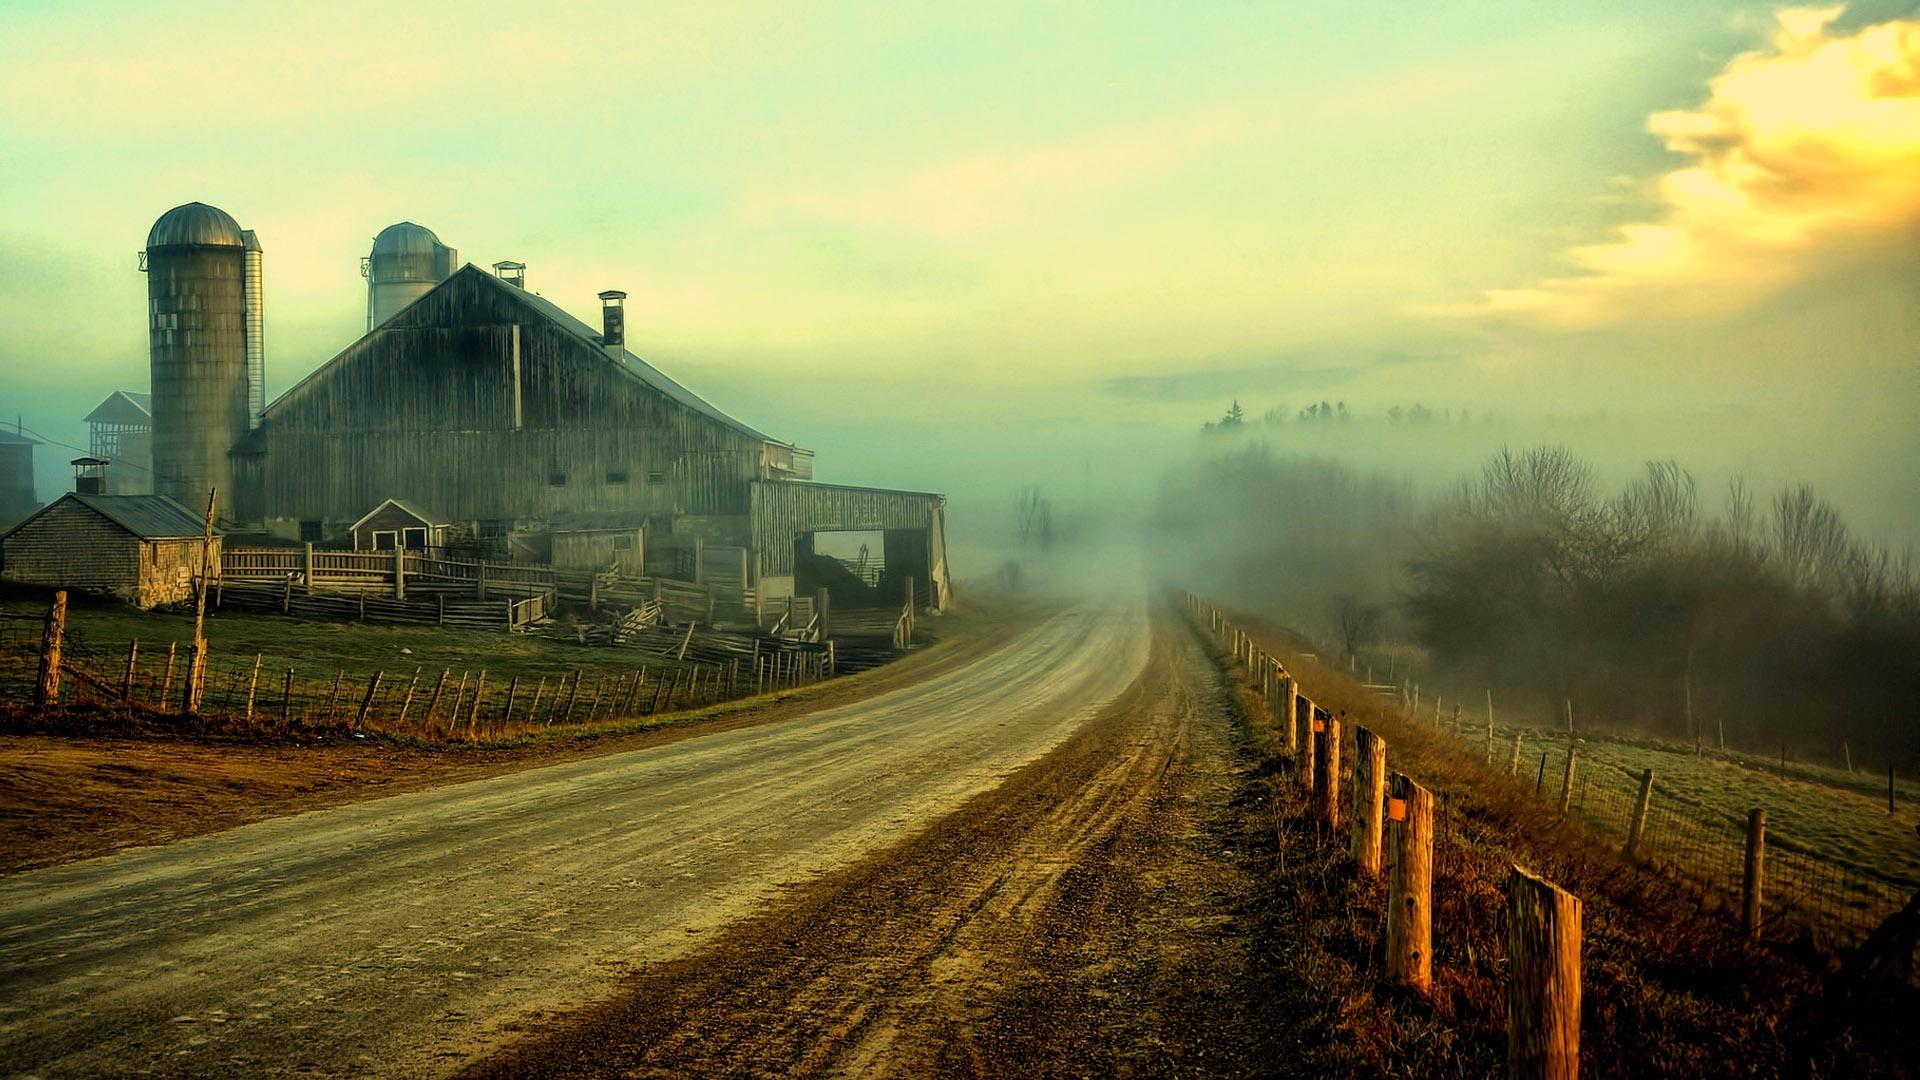 farm rustic roads fence sky clouds houses barn farm wallpaper 1920x1080